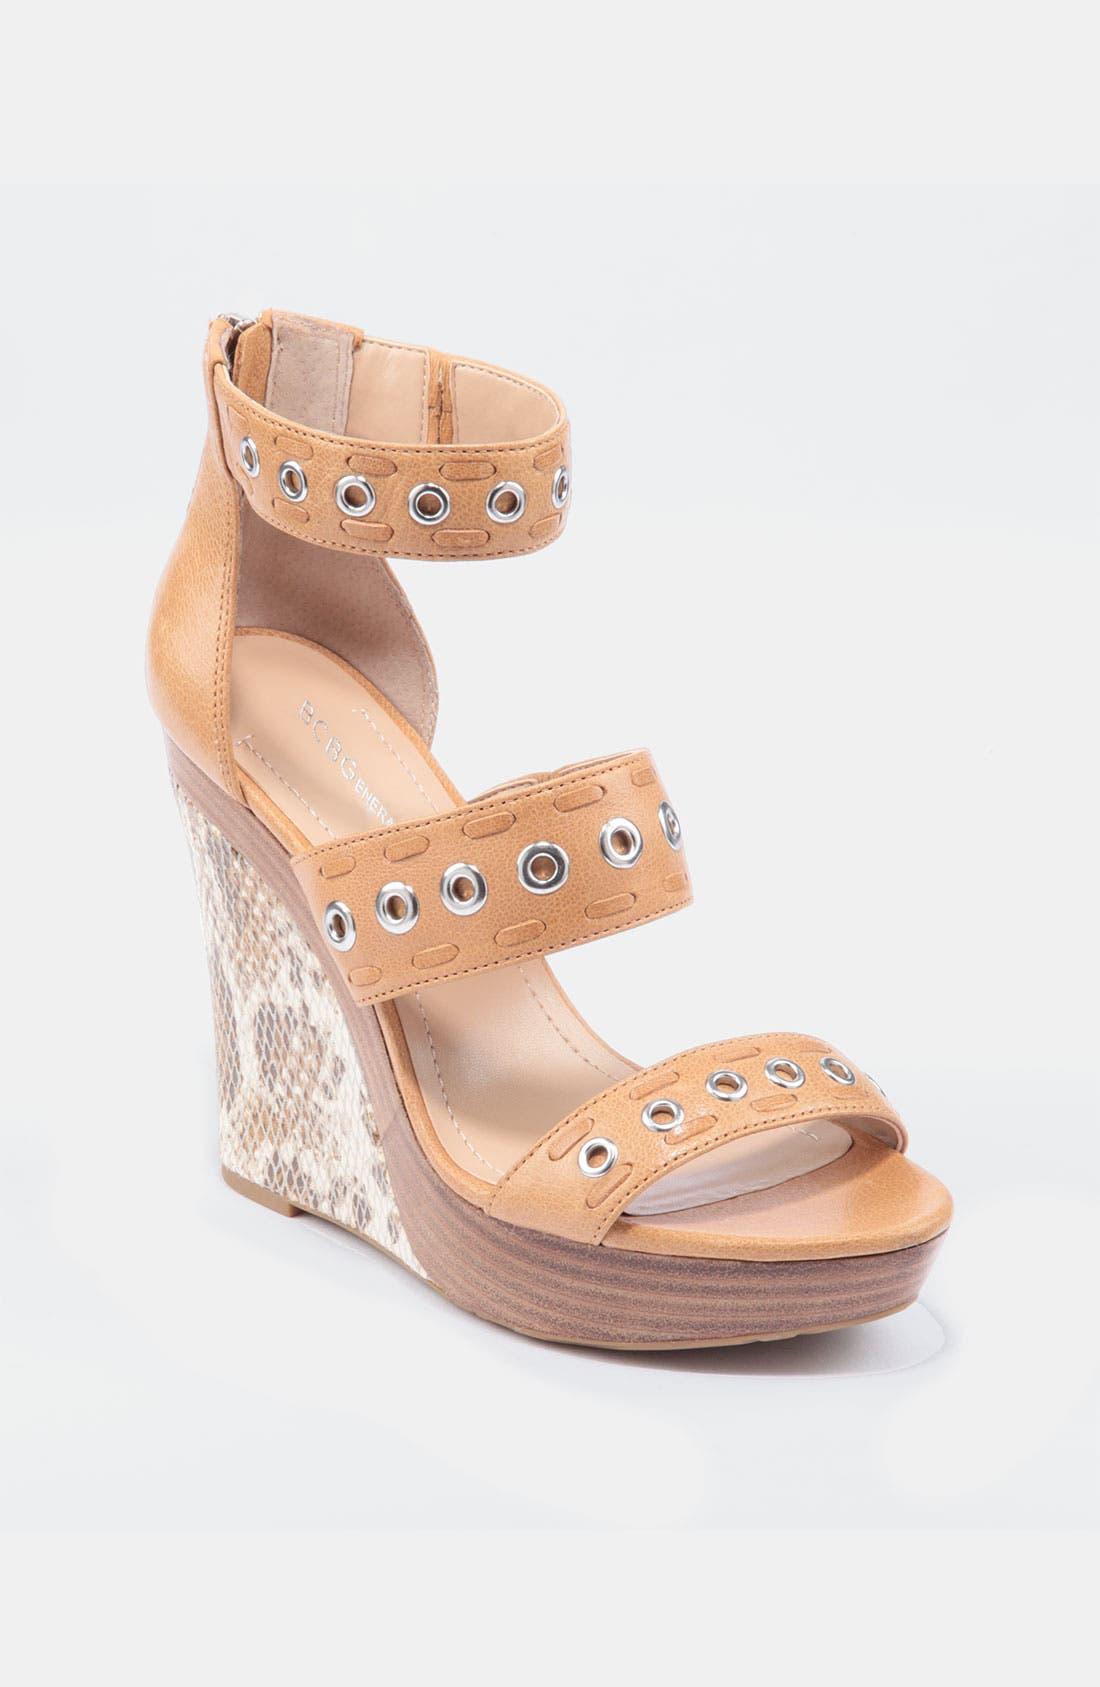 Alternate Image 1 Selected - BCBGeneration 'Cirby' Sandal